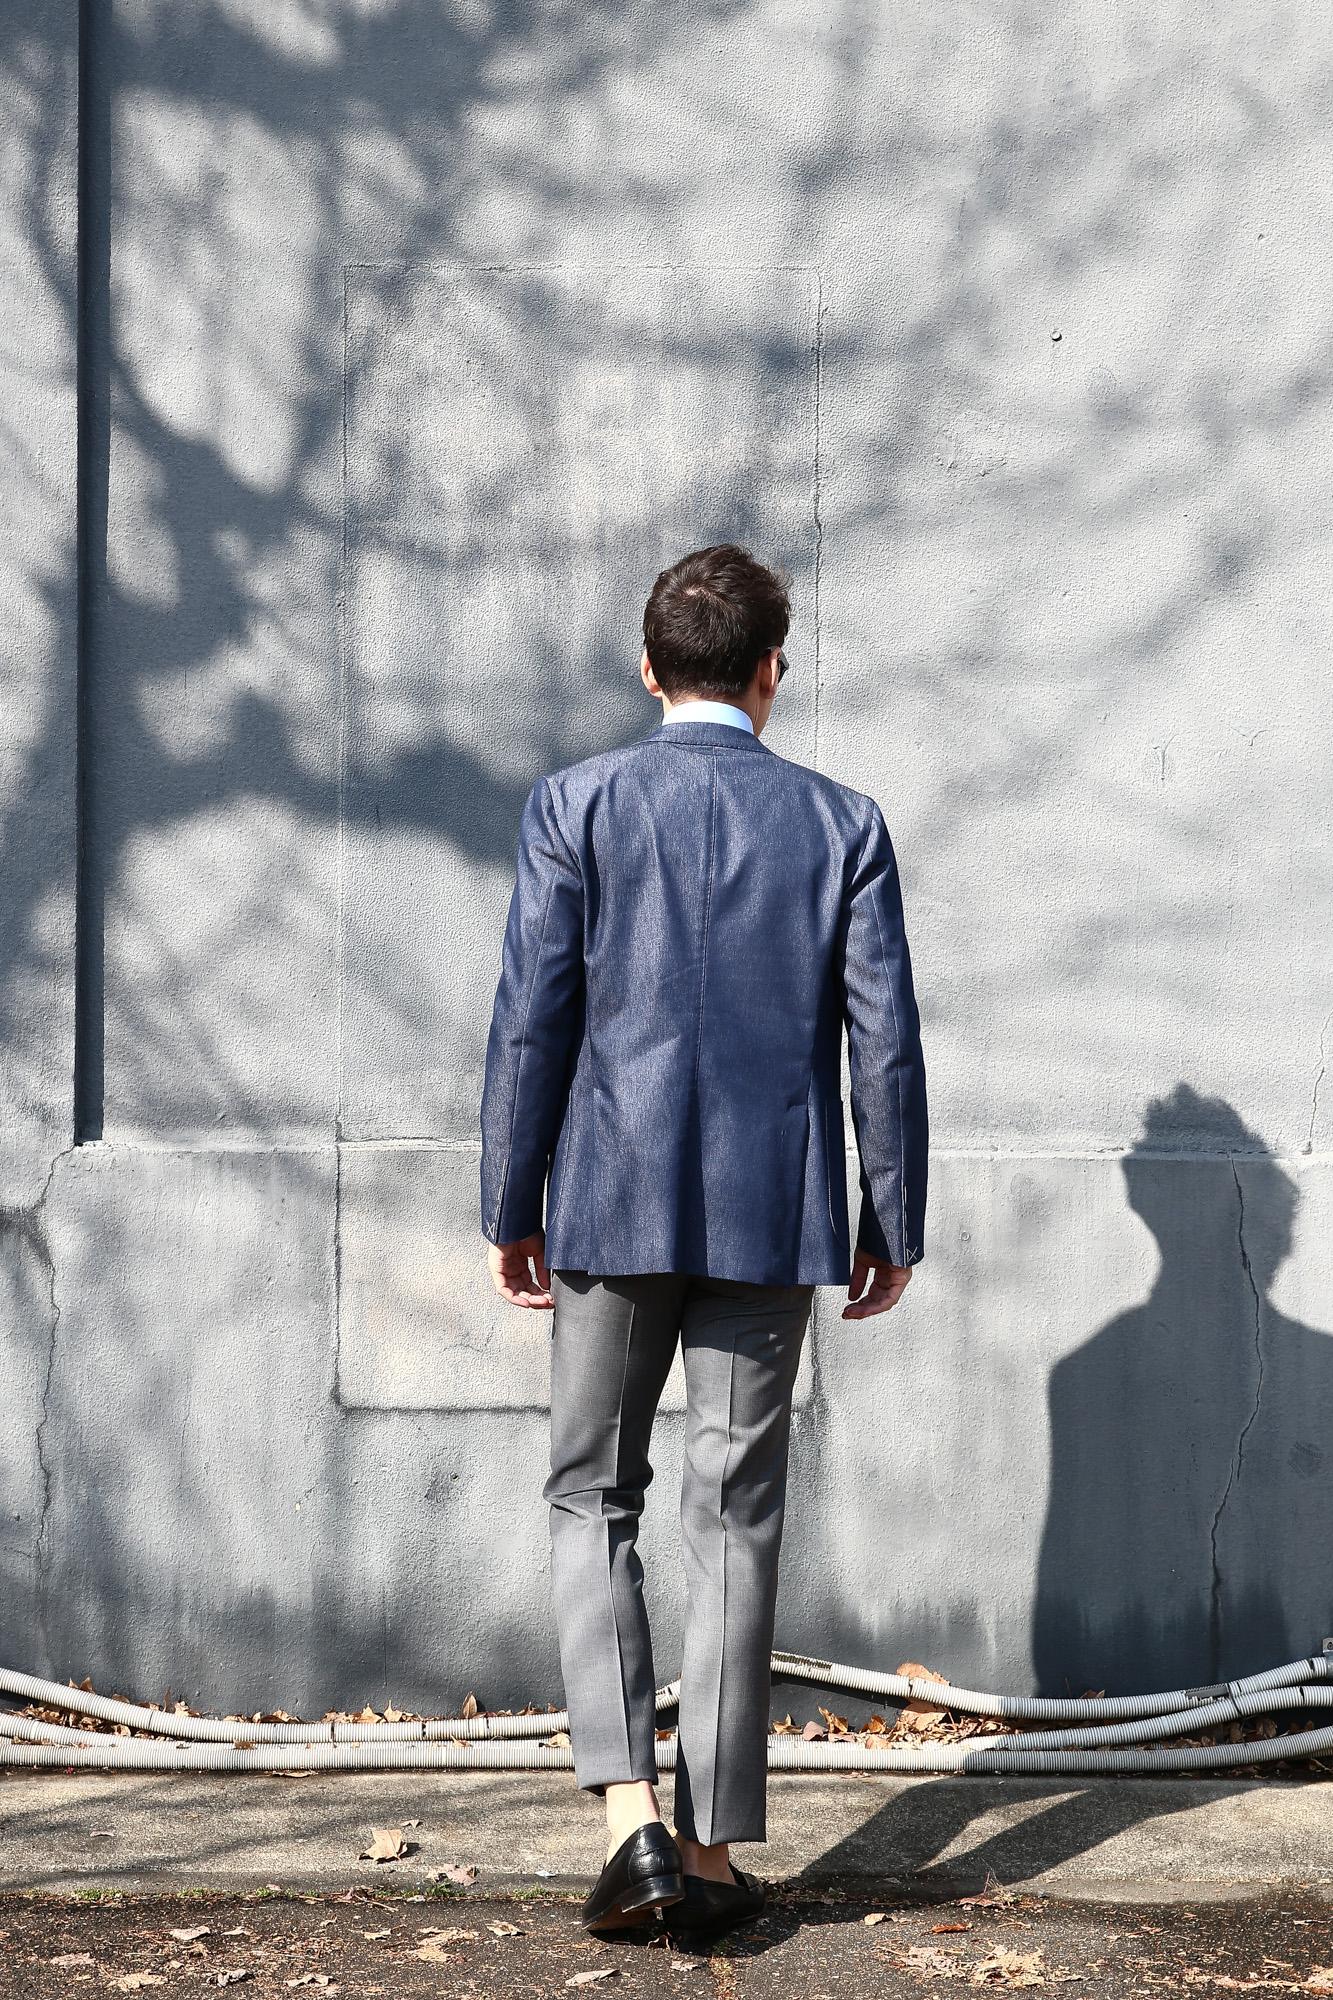 INCOTEX (インコテックス) 1NT035 SLIM FIT SUPER 100'S YARN DYED TROPICAL サマーウール スラックス 【MEDIUM GRAY / ミディアムグレー・910】 2018 春夏新作 incotex インコテックス グレスラ 愛知 名古屋 Alto e Diritto アルト エ デリット